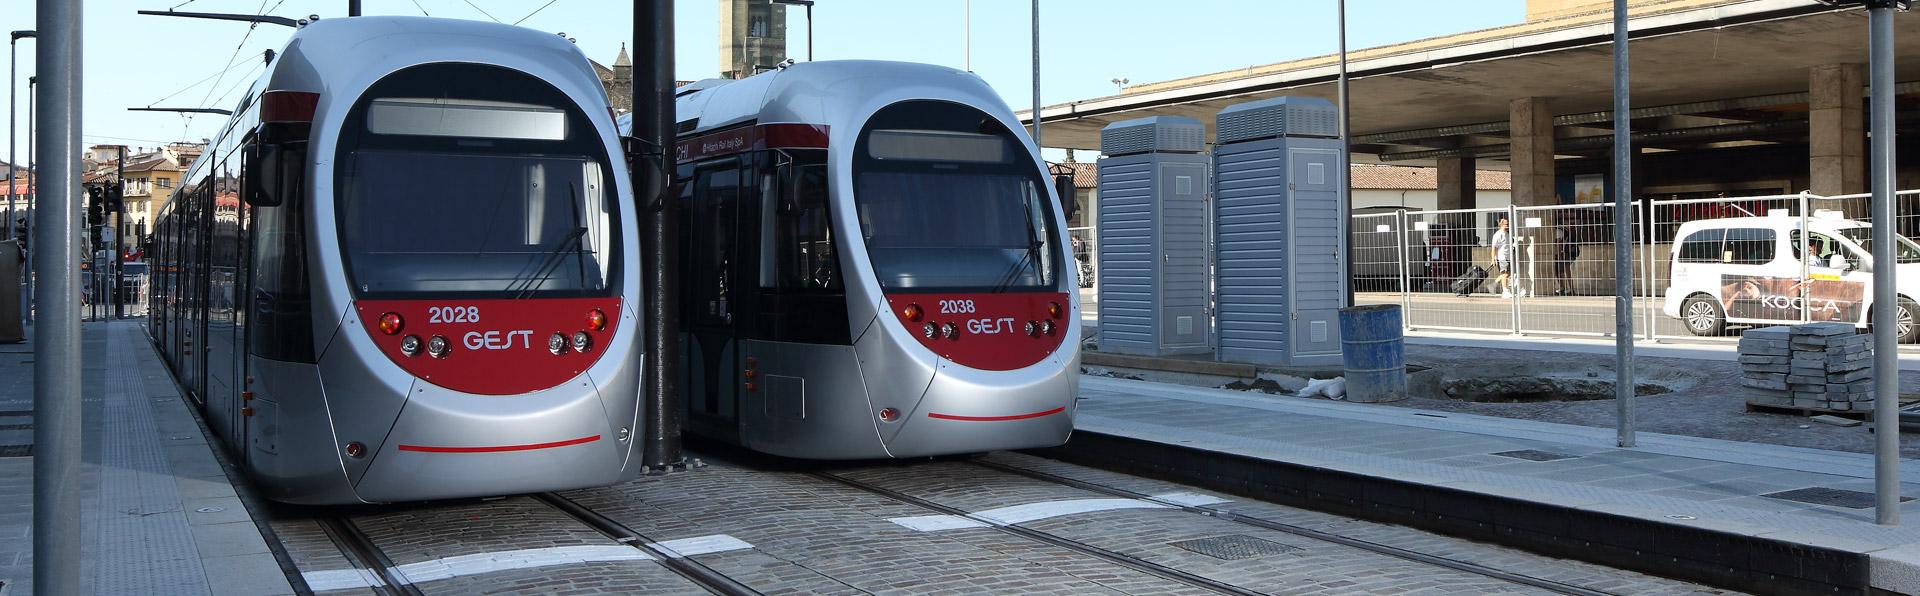 cmb-infrastrutture-infrastructures-firenze-tramvia-tramline-florence